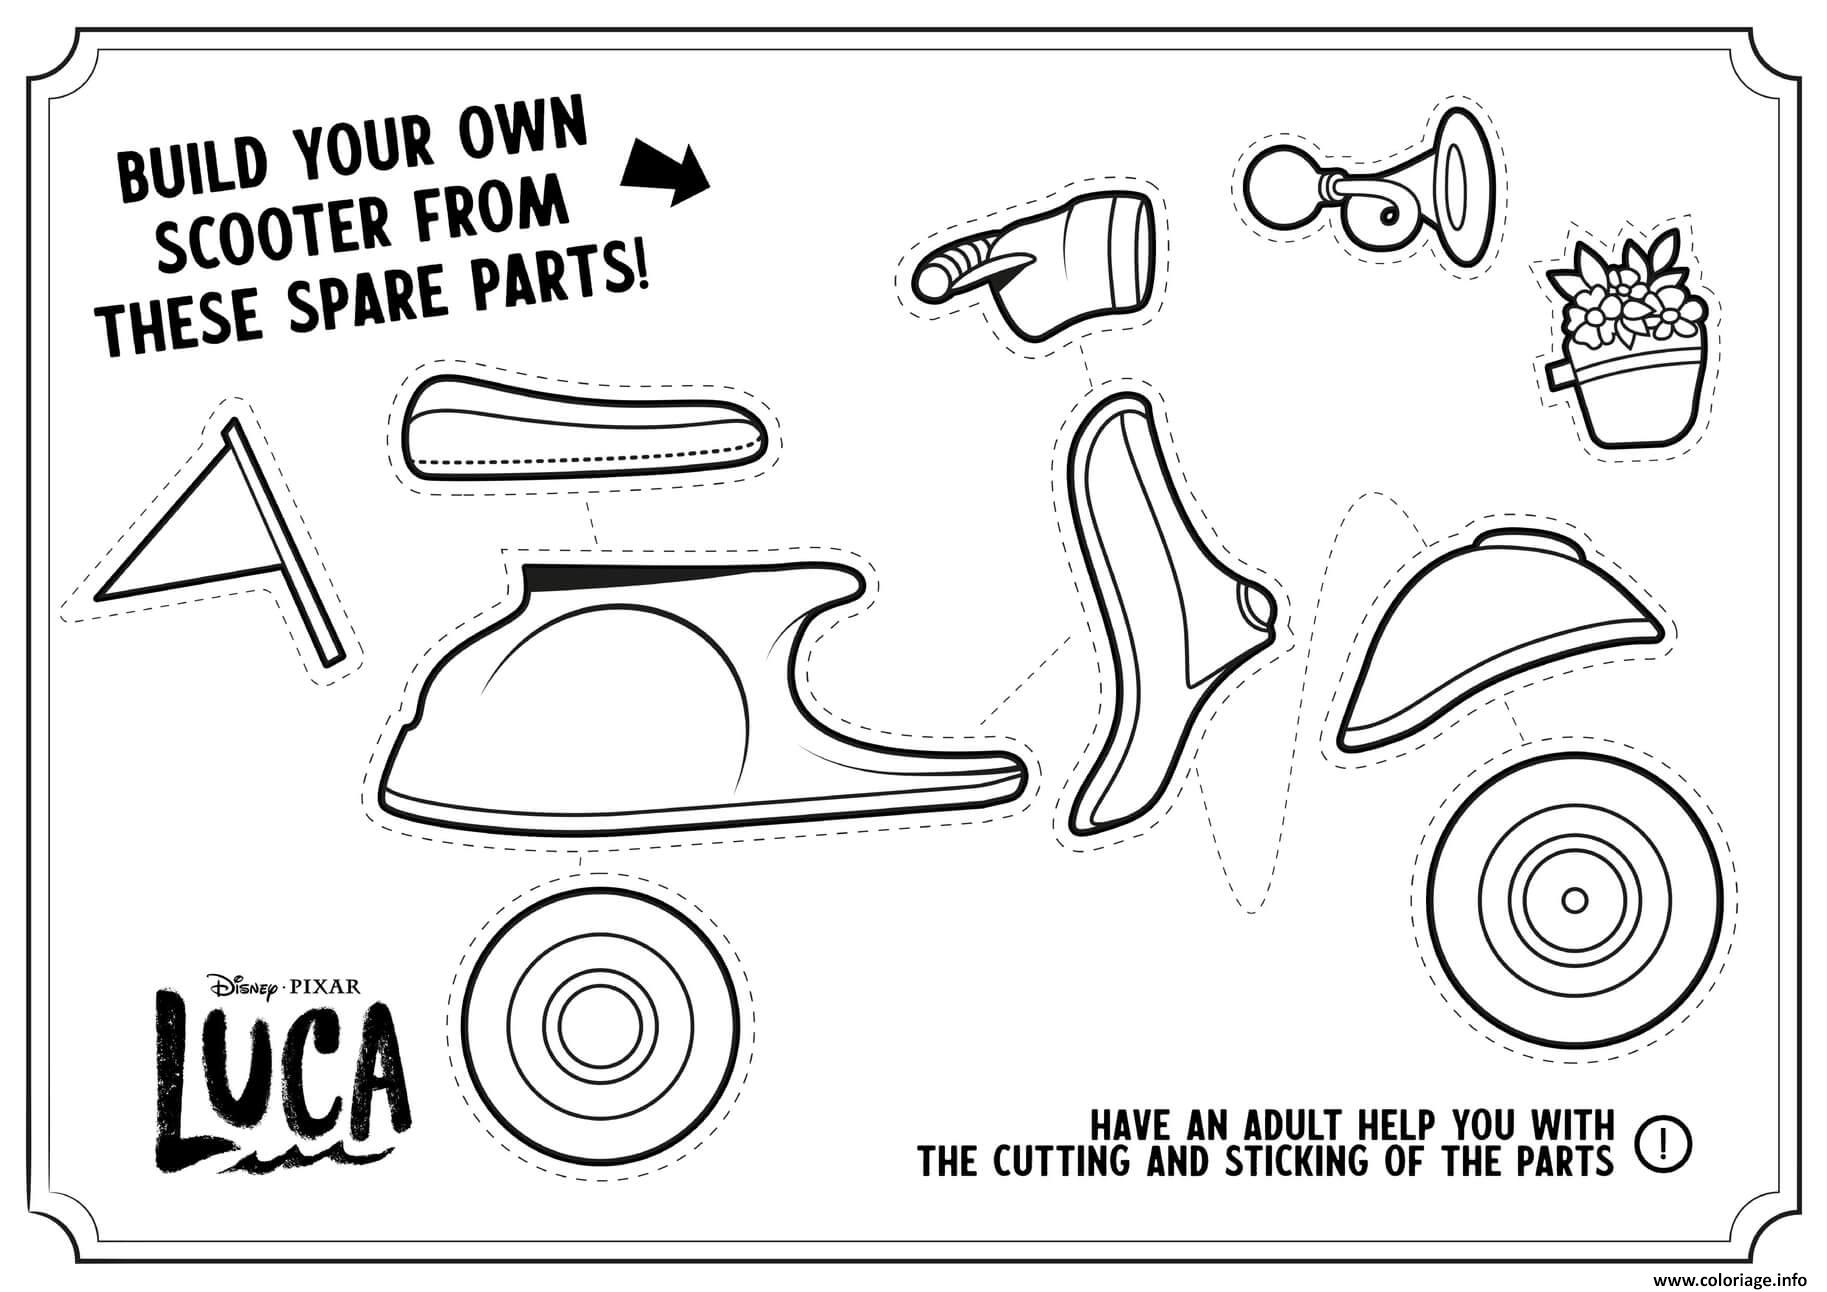 Dessin construire sa propre moto bricolage Coloriage Gratuit à Imprimer